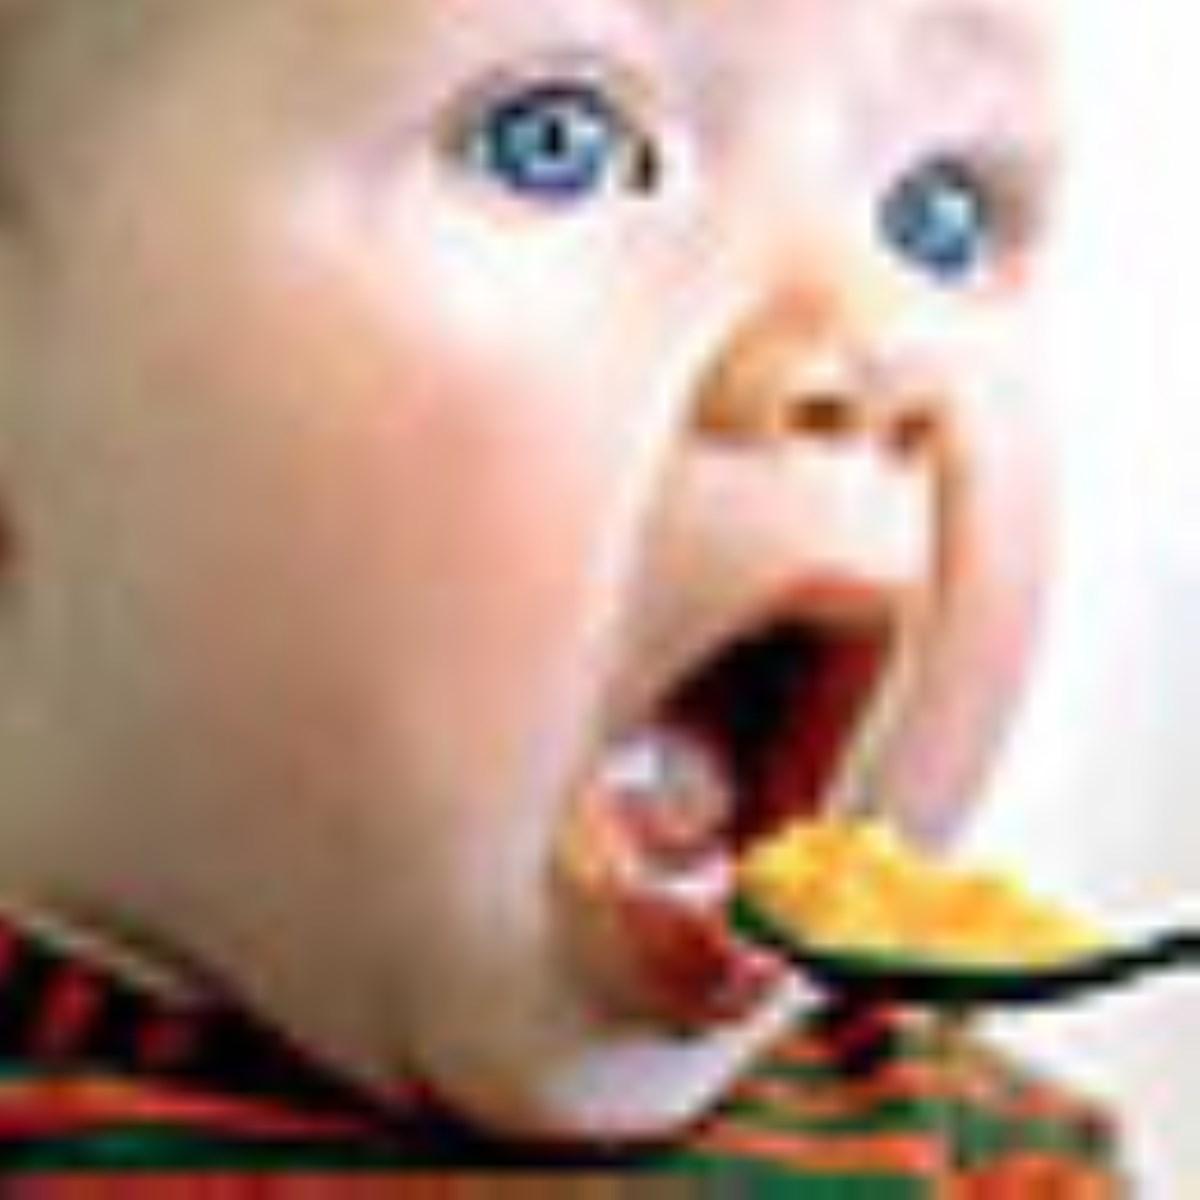 کاهش اشتها و بي اشتهايي در کودکان بالاي يکسال